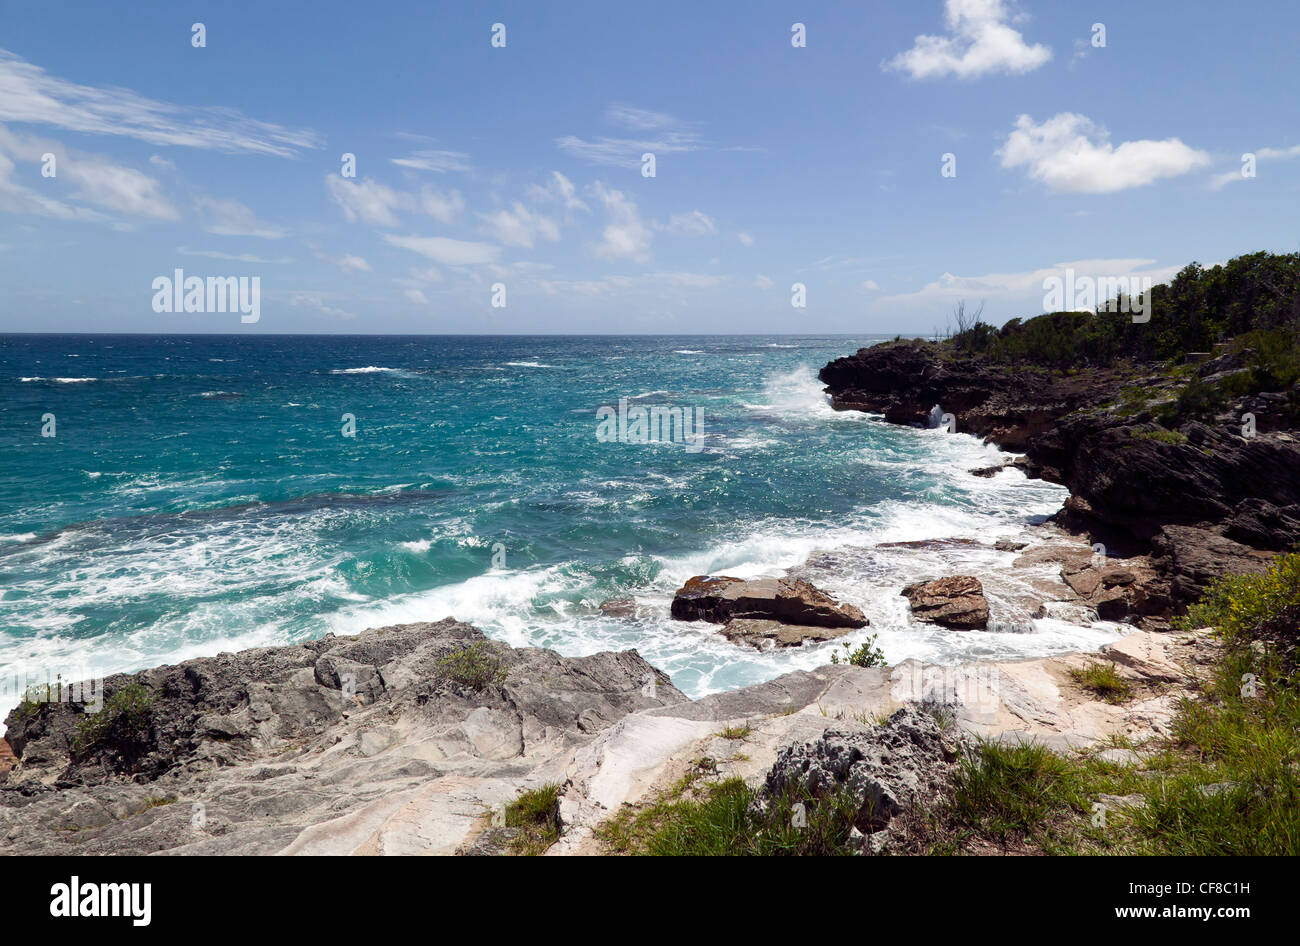 Coastal section of Spittal Pond Nature Reserve, Smith's Parish, Bermuda - Stock Image